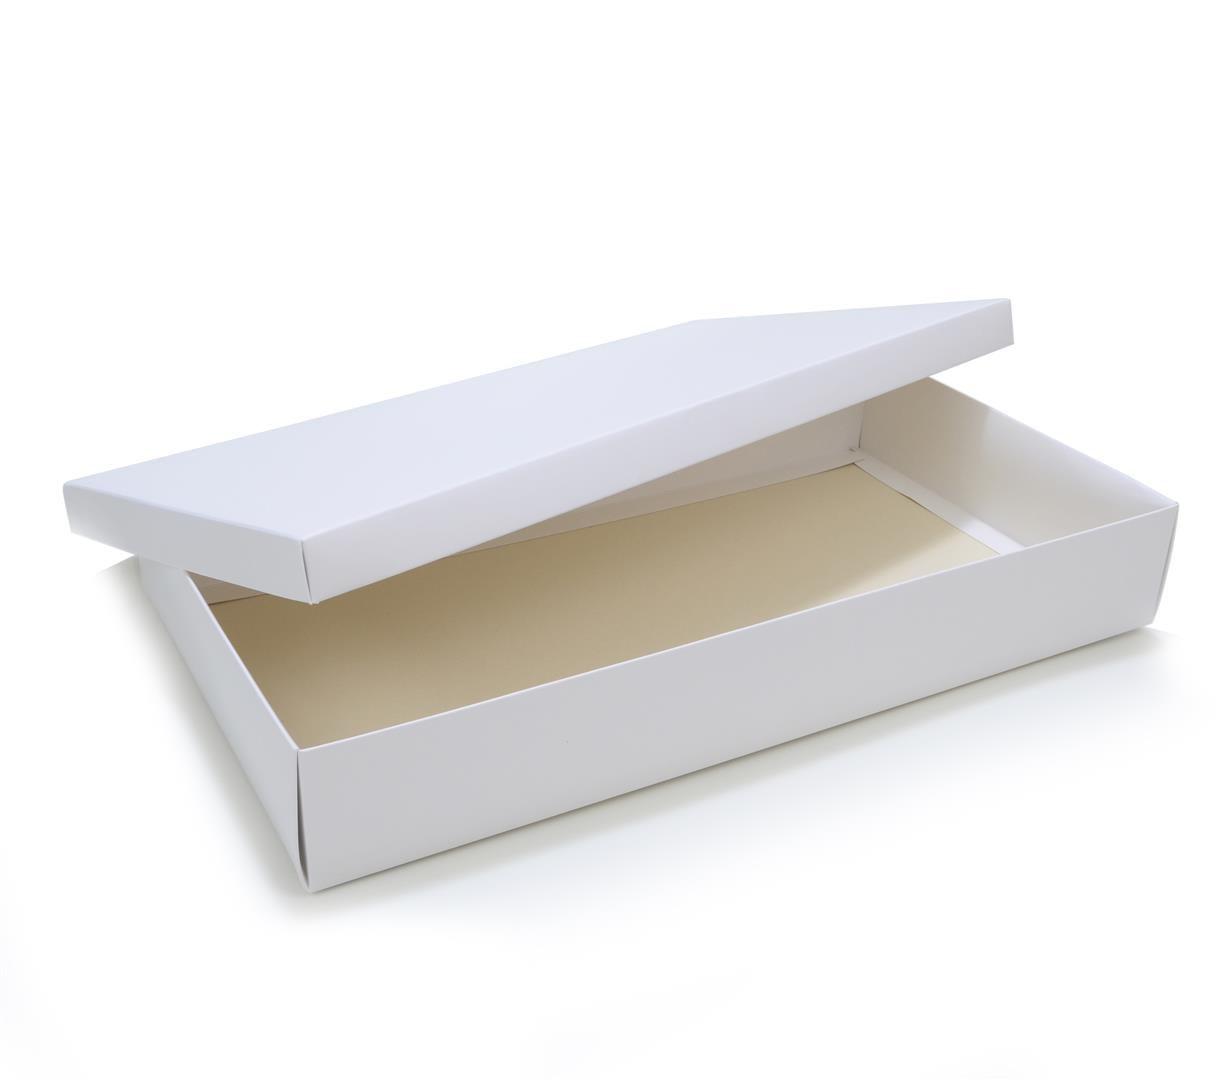 Ref 132 Branca Alta - Caixa c/ tampa papel - 43x23x6,5 cm - c/ 10 unidades